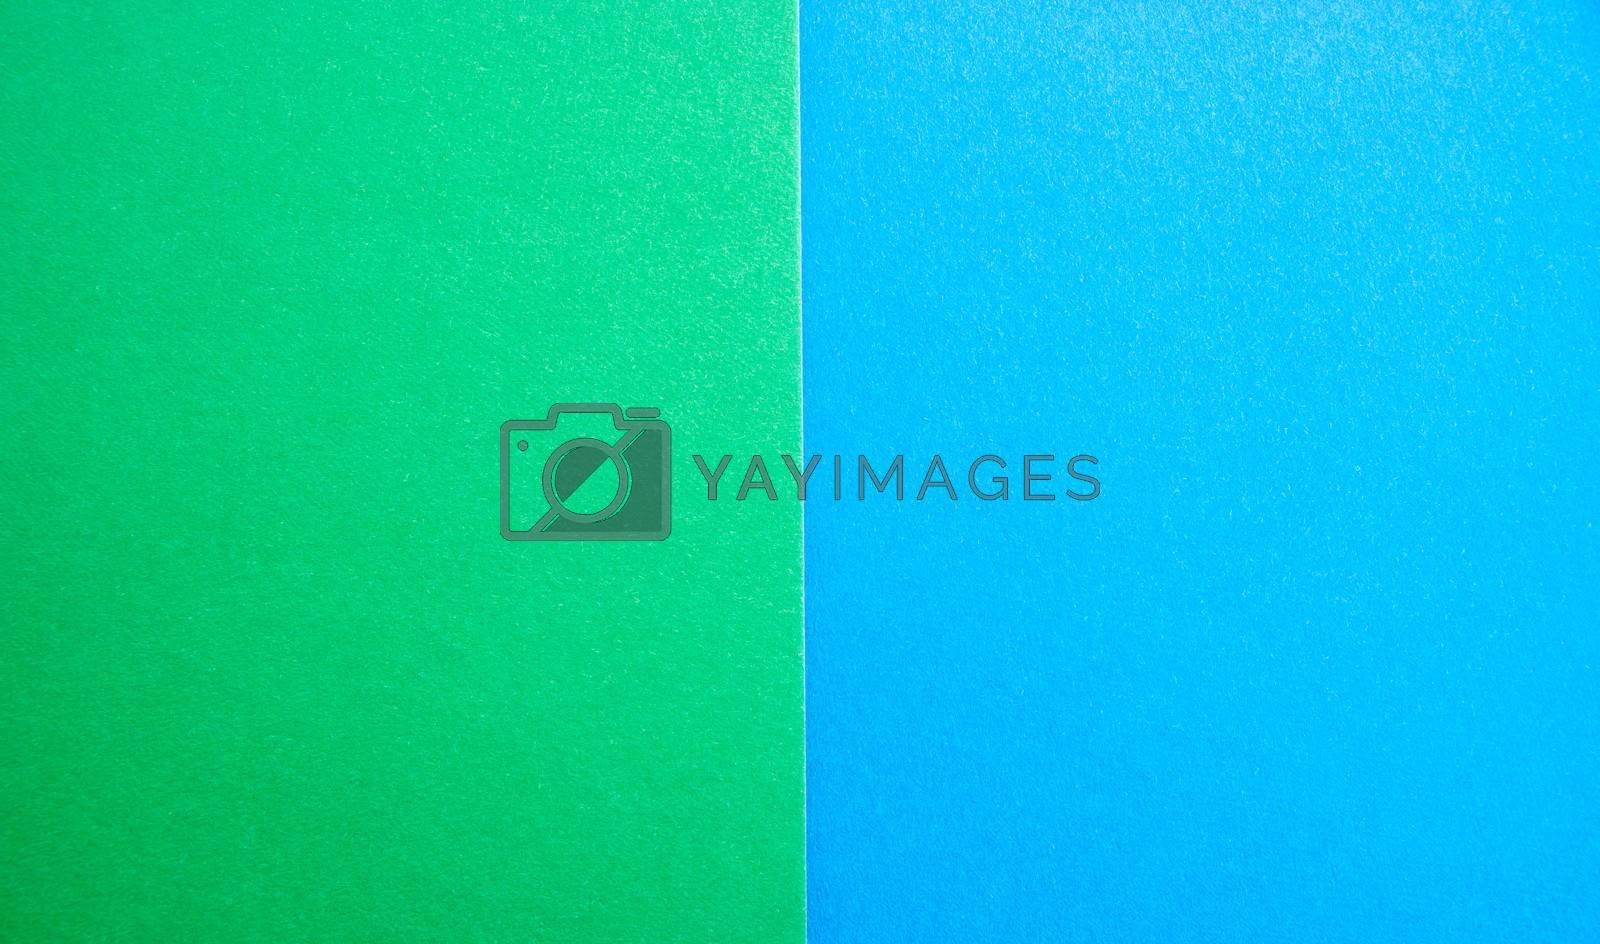 blue-green matte suede background, close-up. Velvety texture